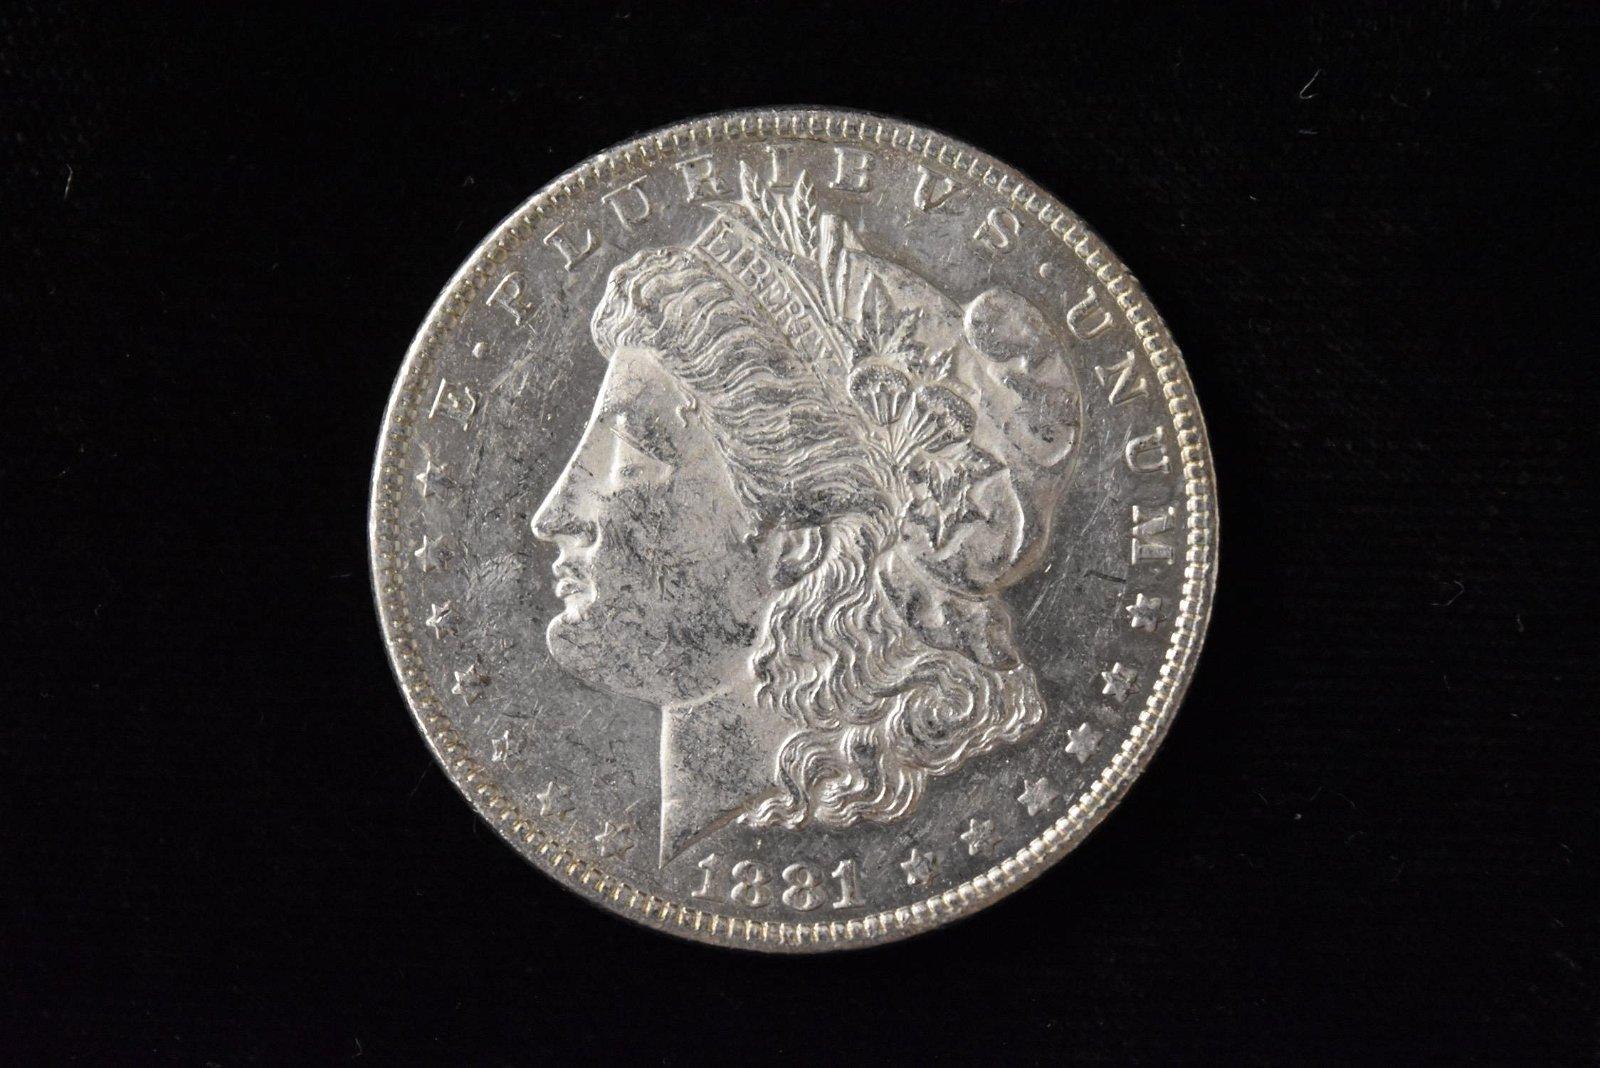 1881 High Grade Morgan Silver Dollar Grade By Picture.